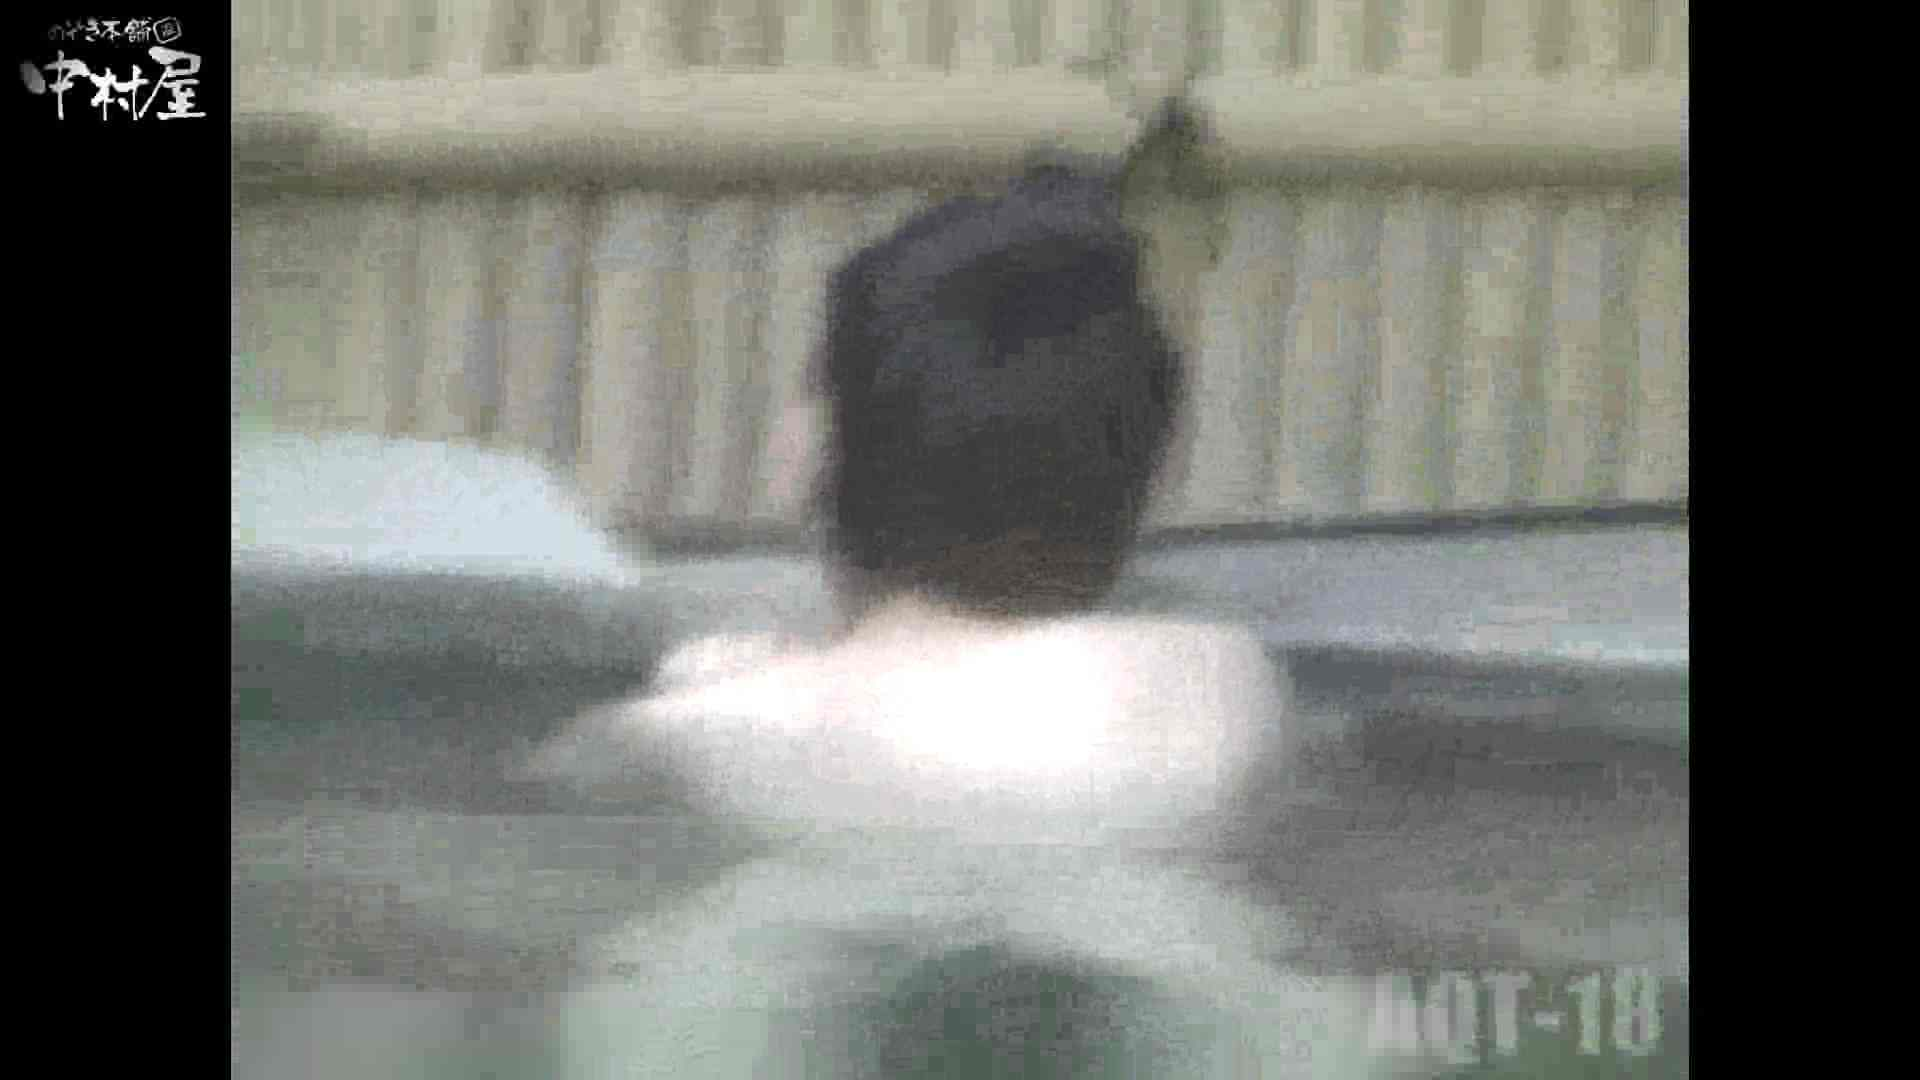 Aquaな露天風呂Vol.882潜入盗撮露天風呂十八判湯 其の二 OLセックス  90画像 44